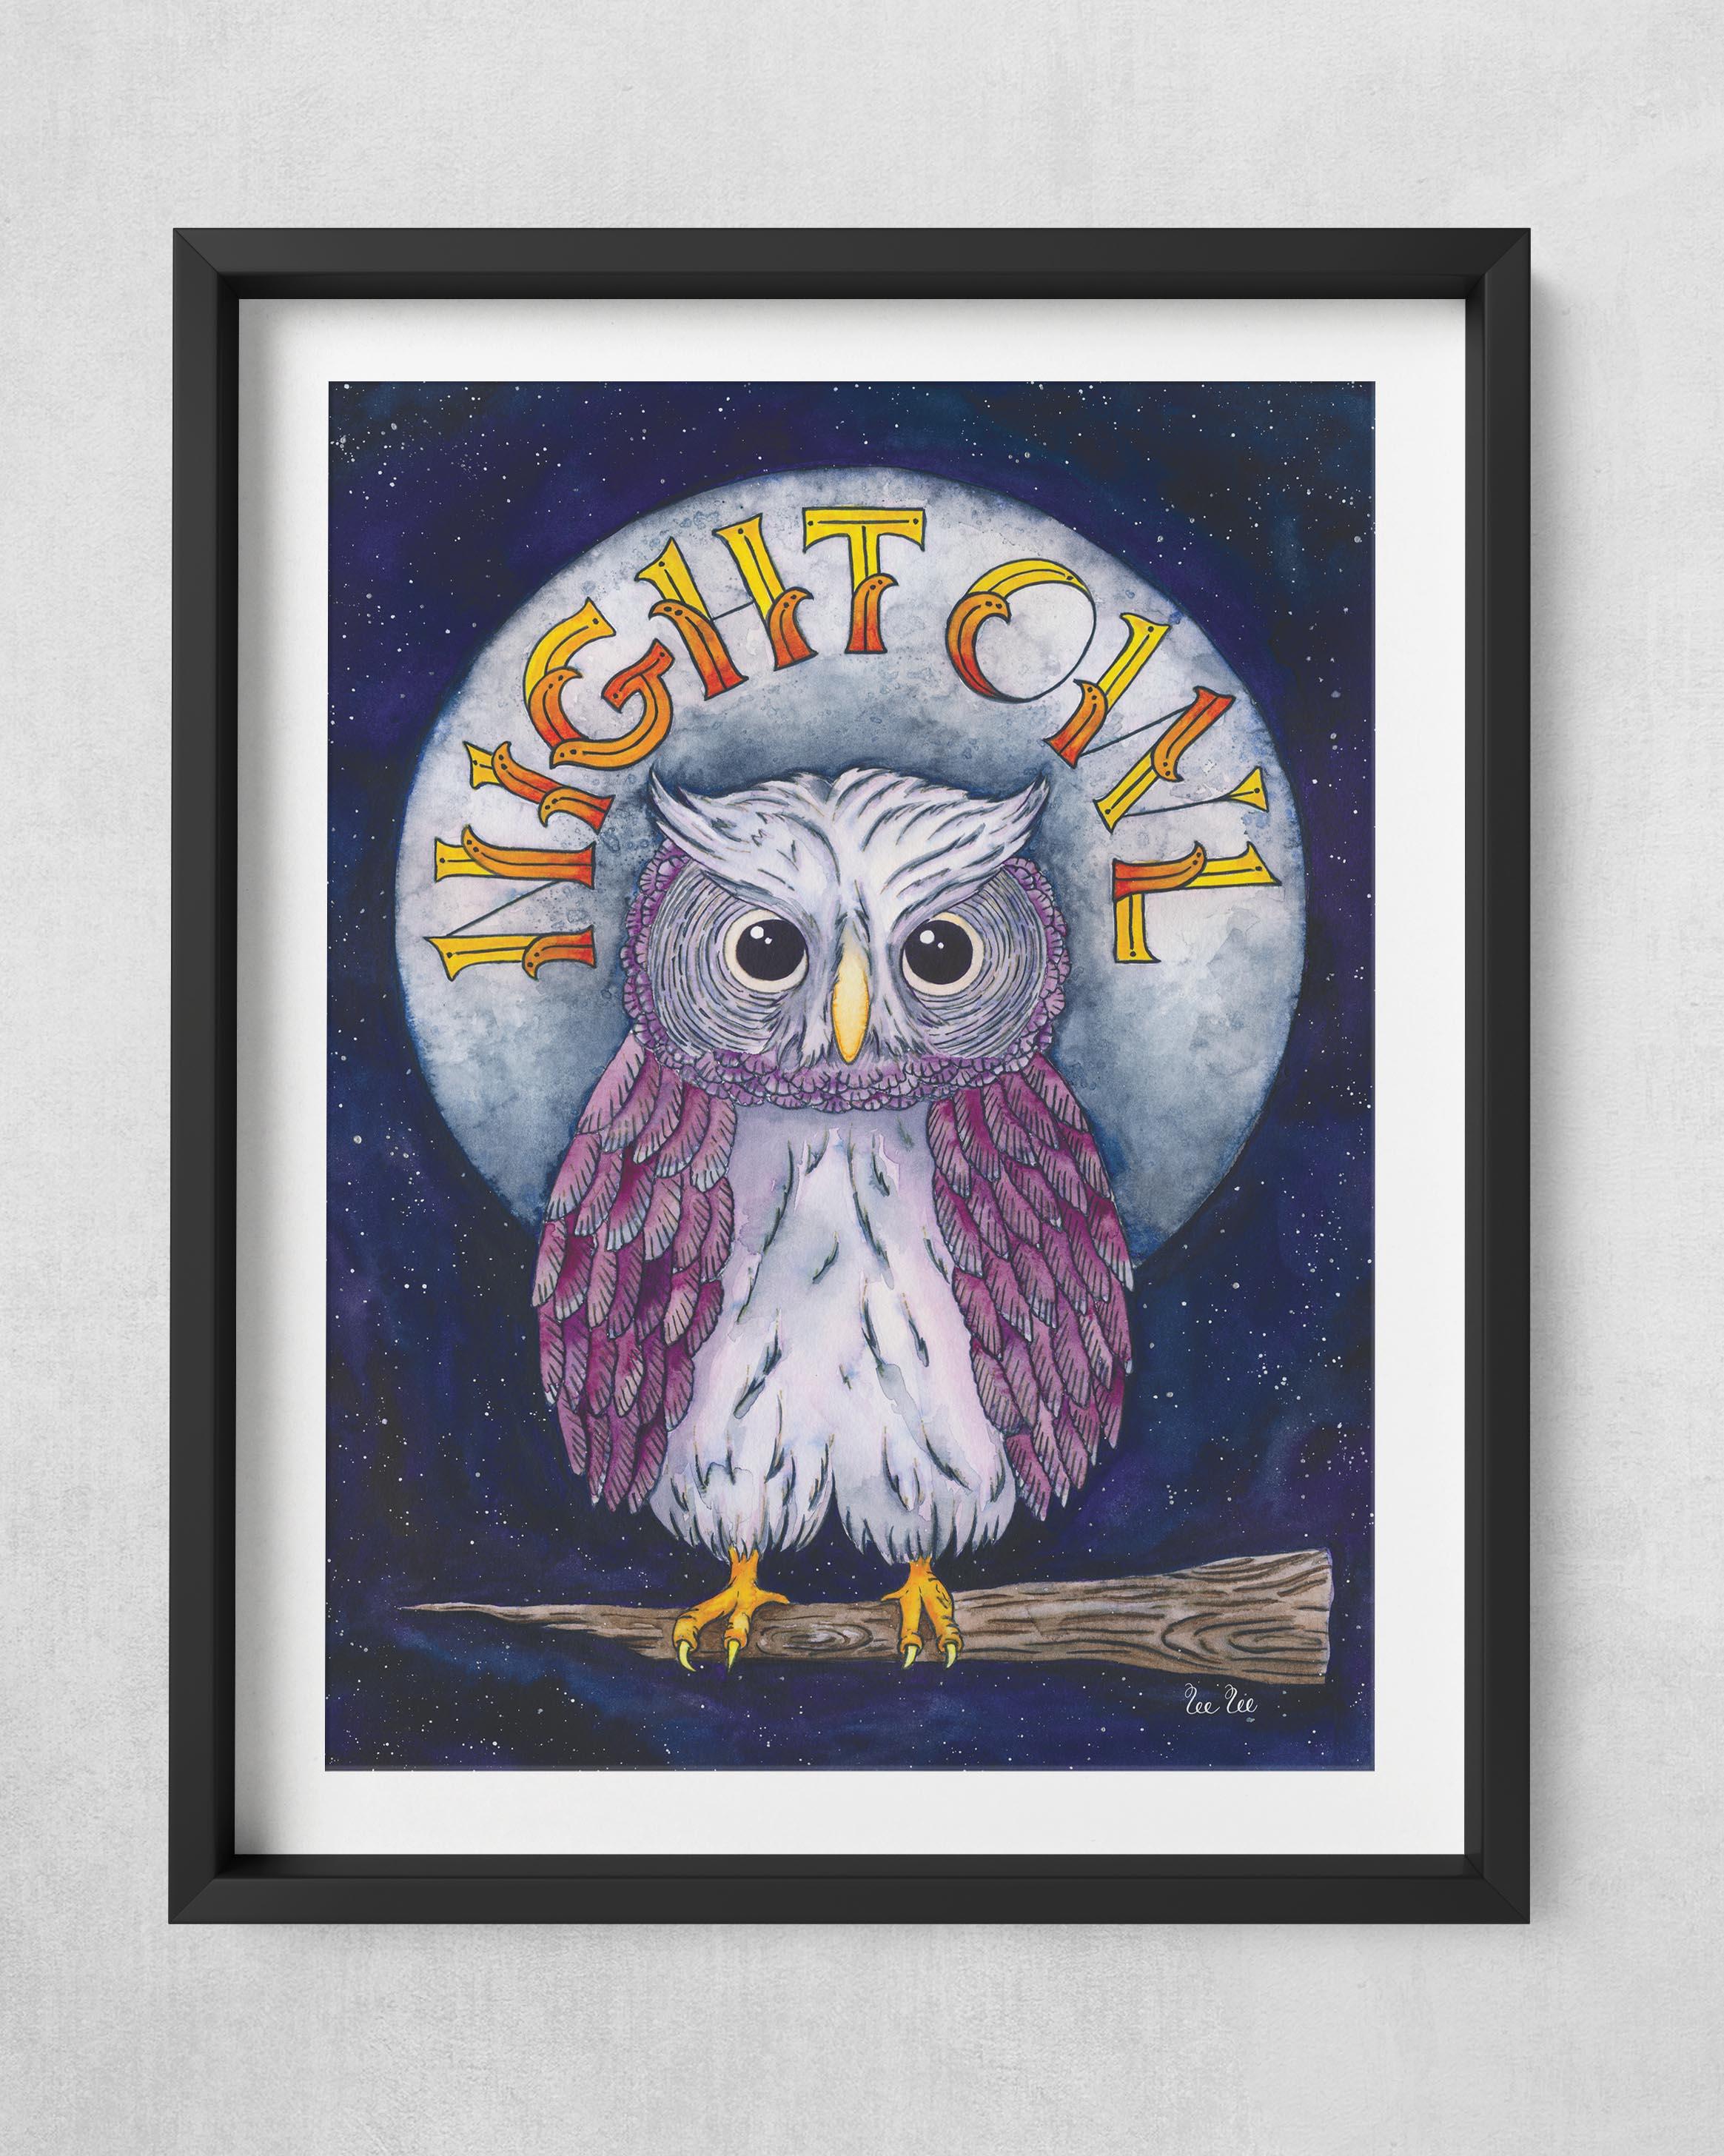 NightOwl-12x16Print-18x14frame-BlackFram